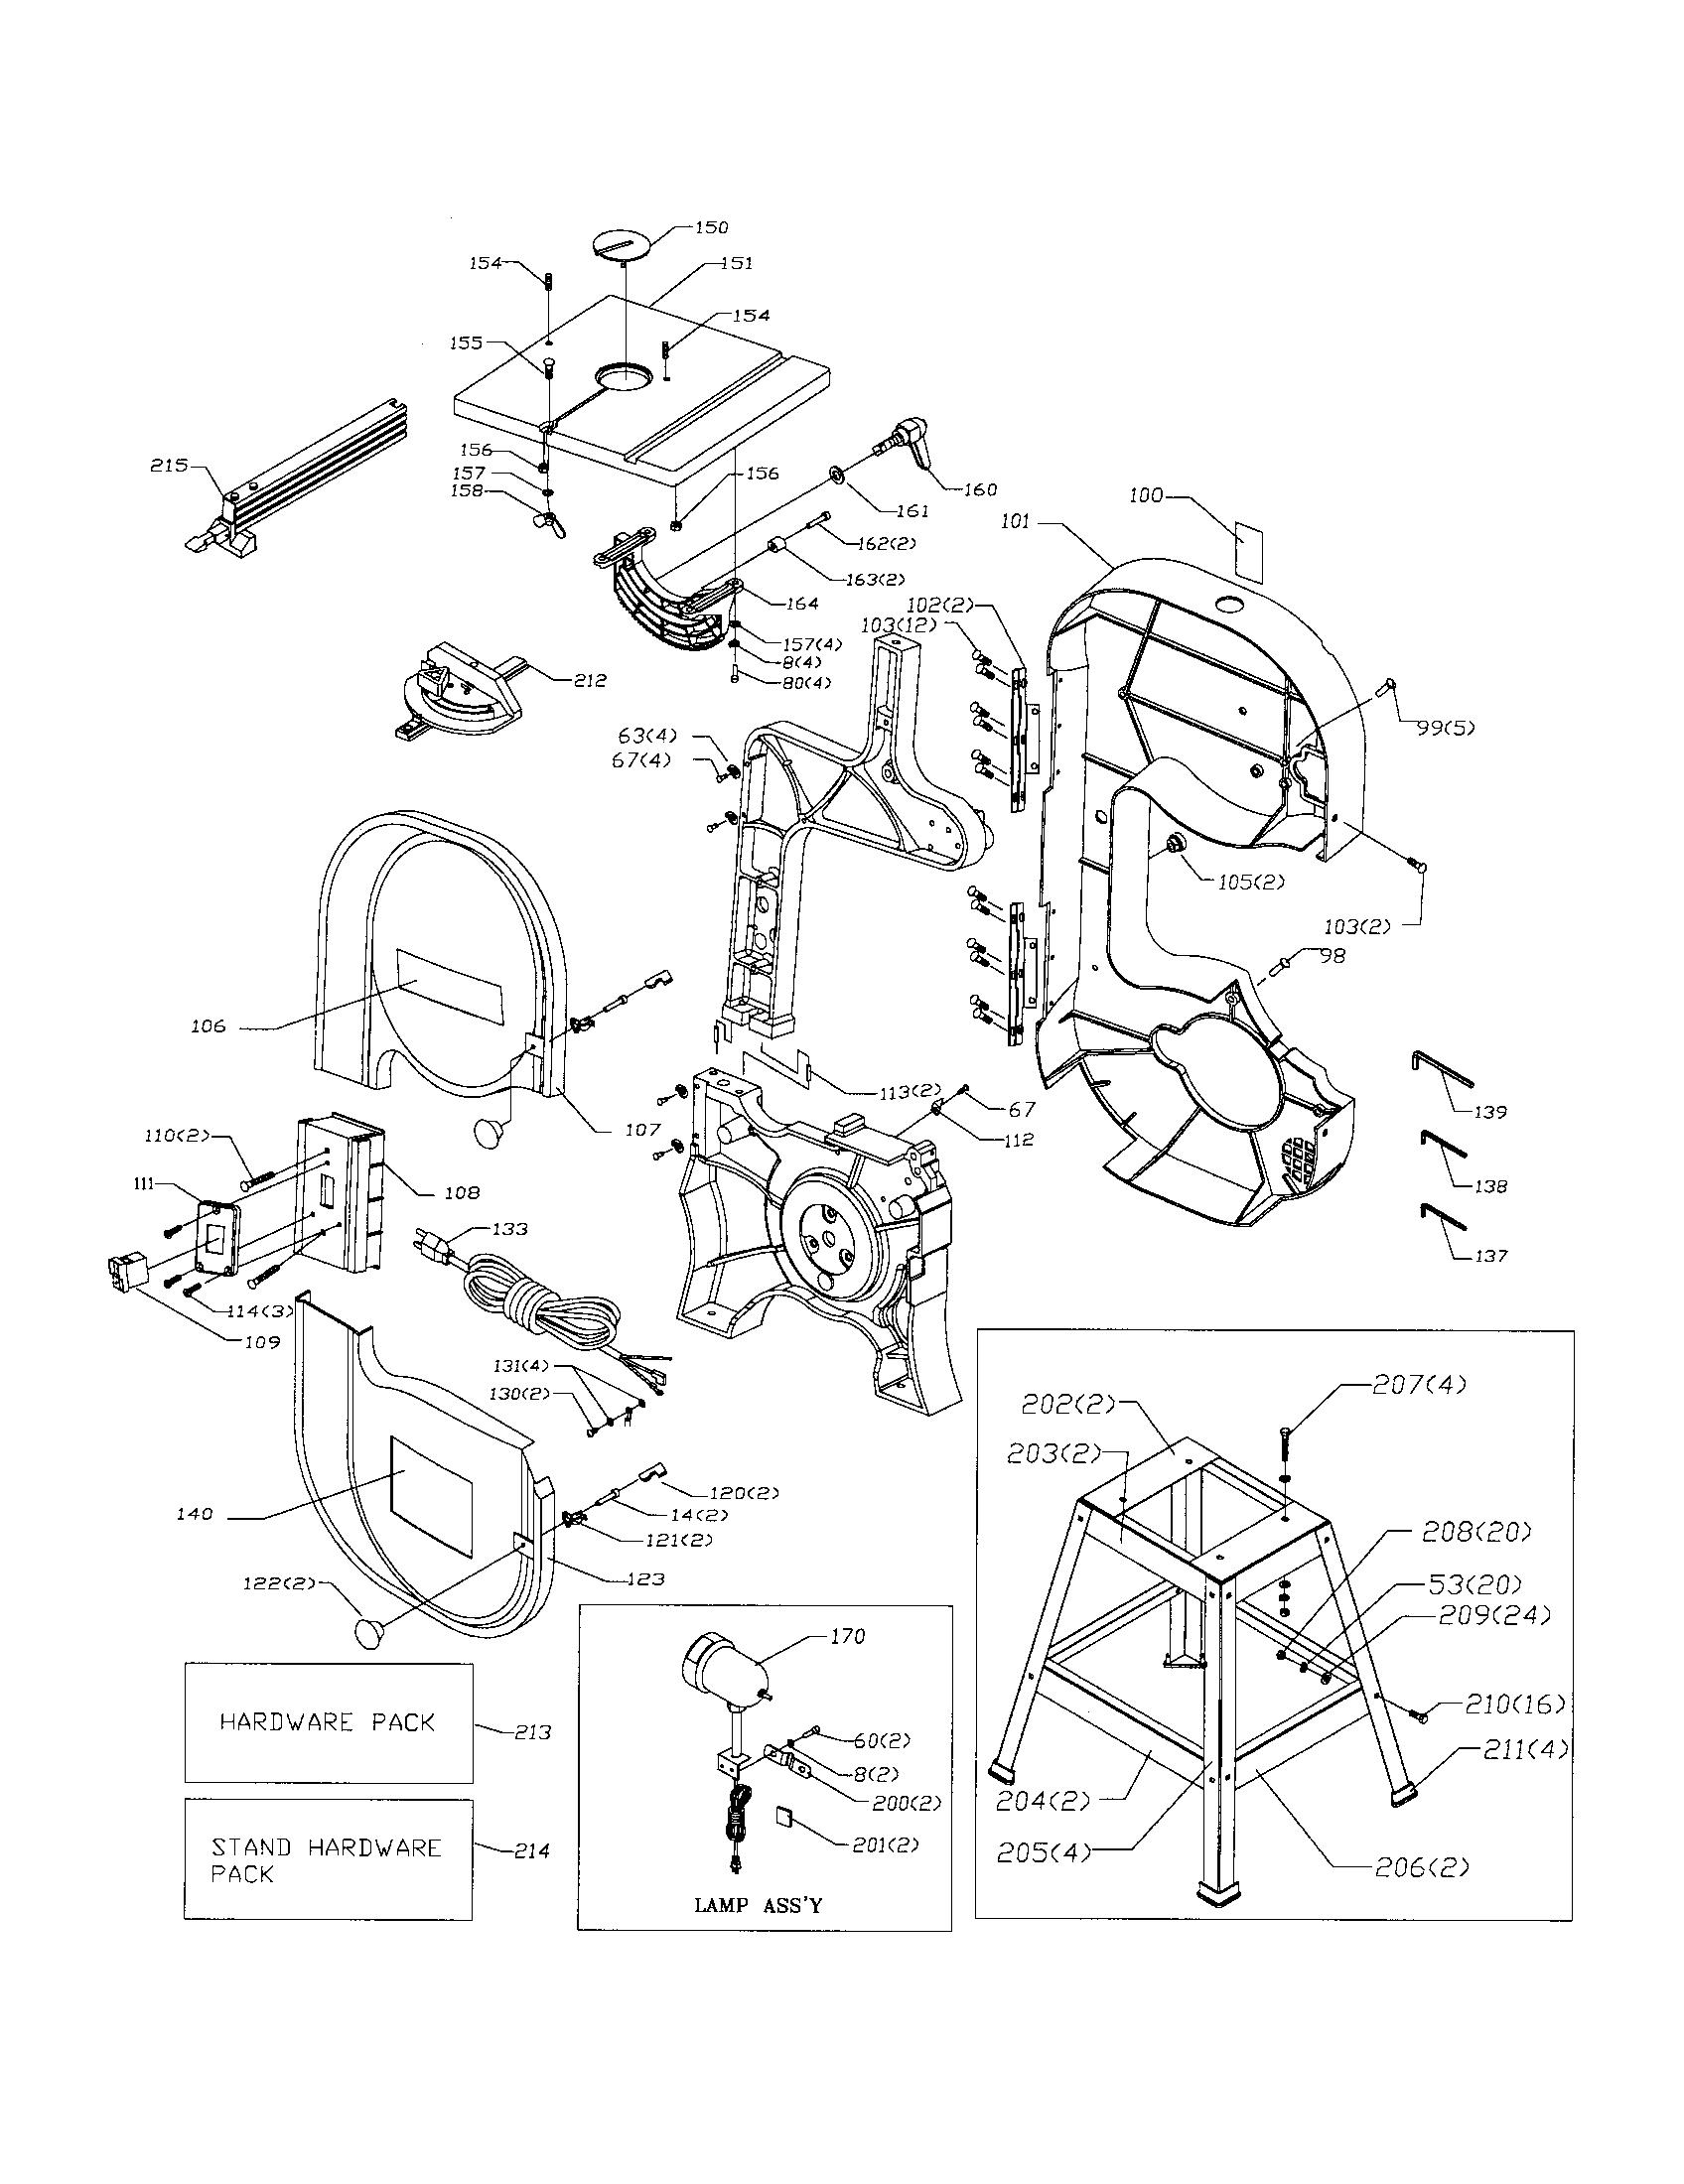 Band Saw Diagram